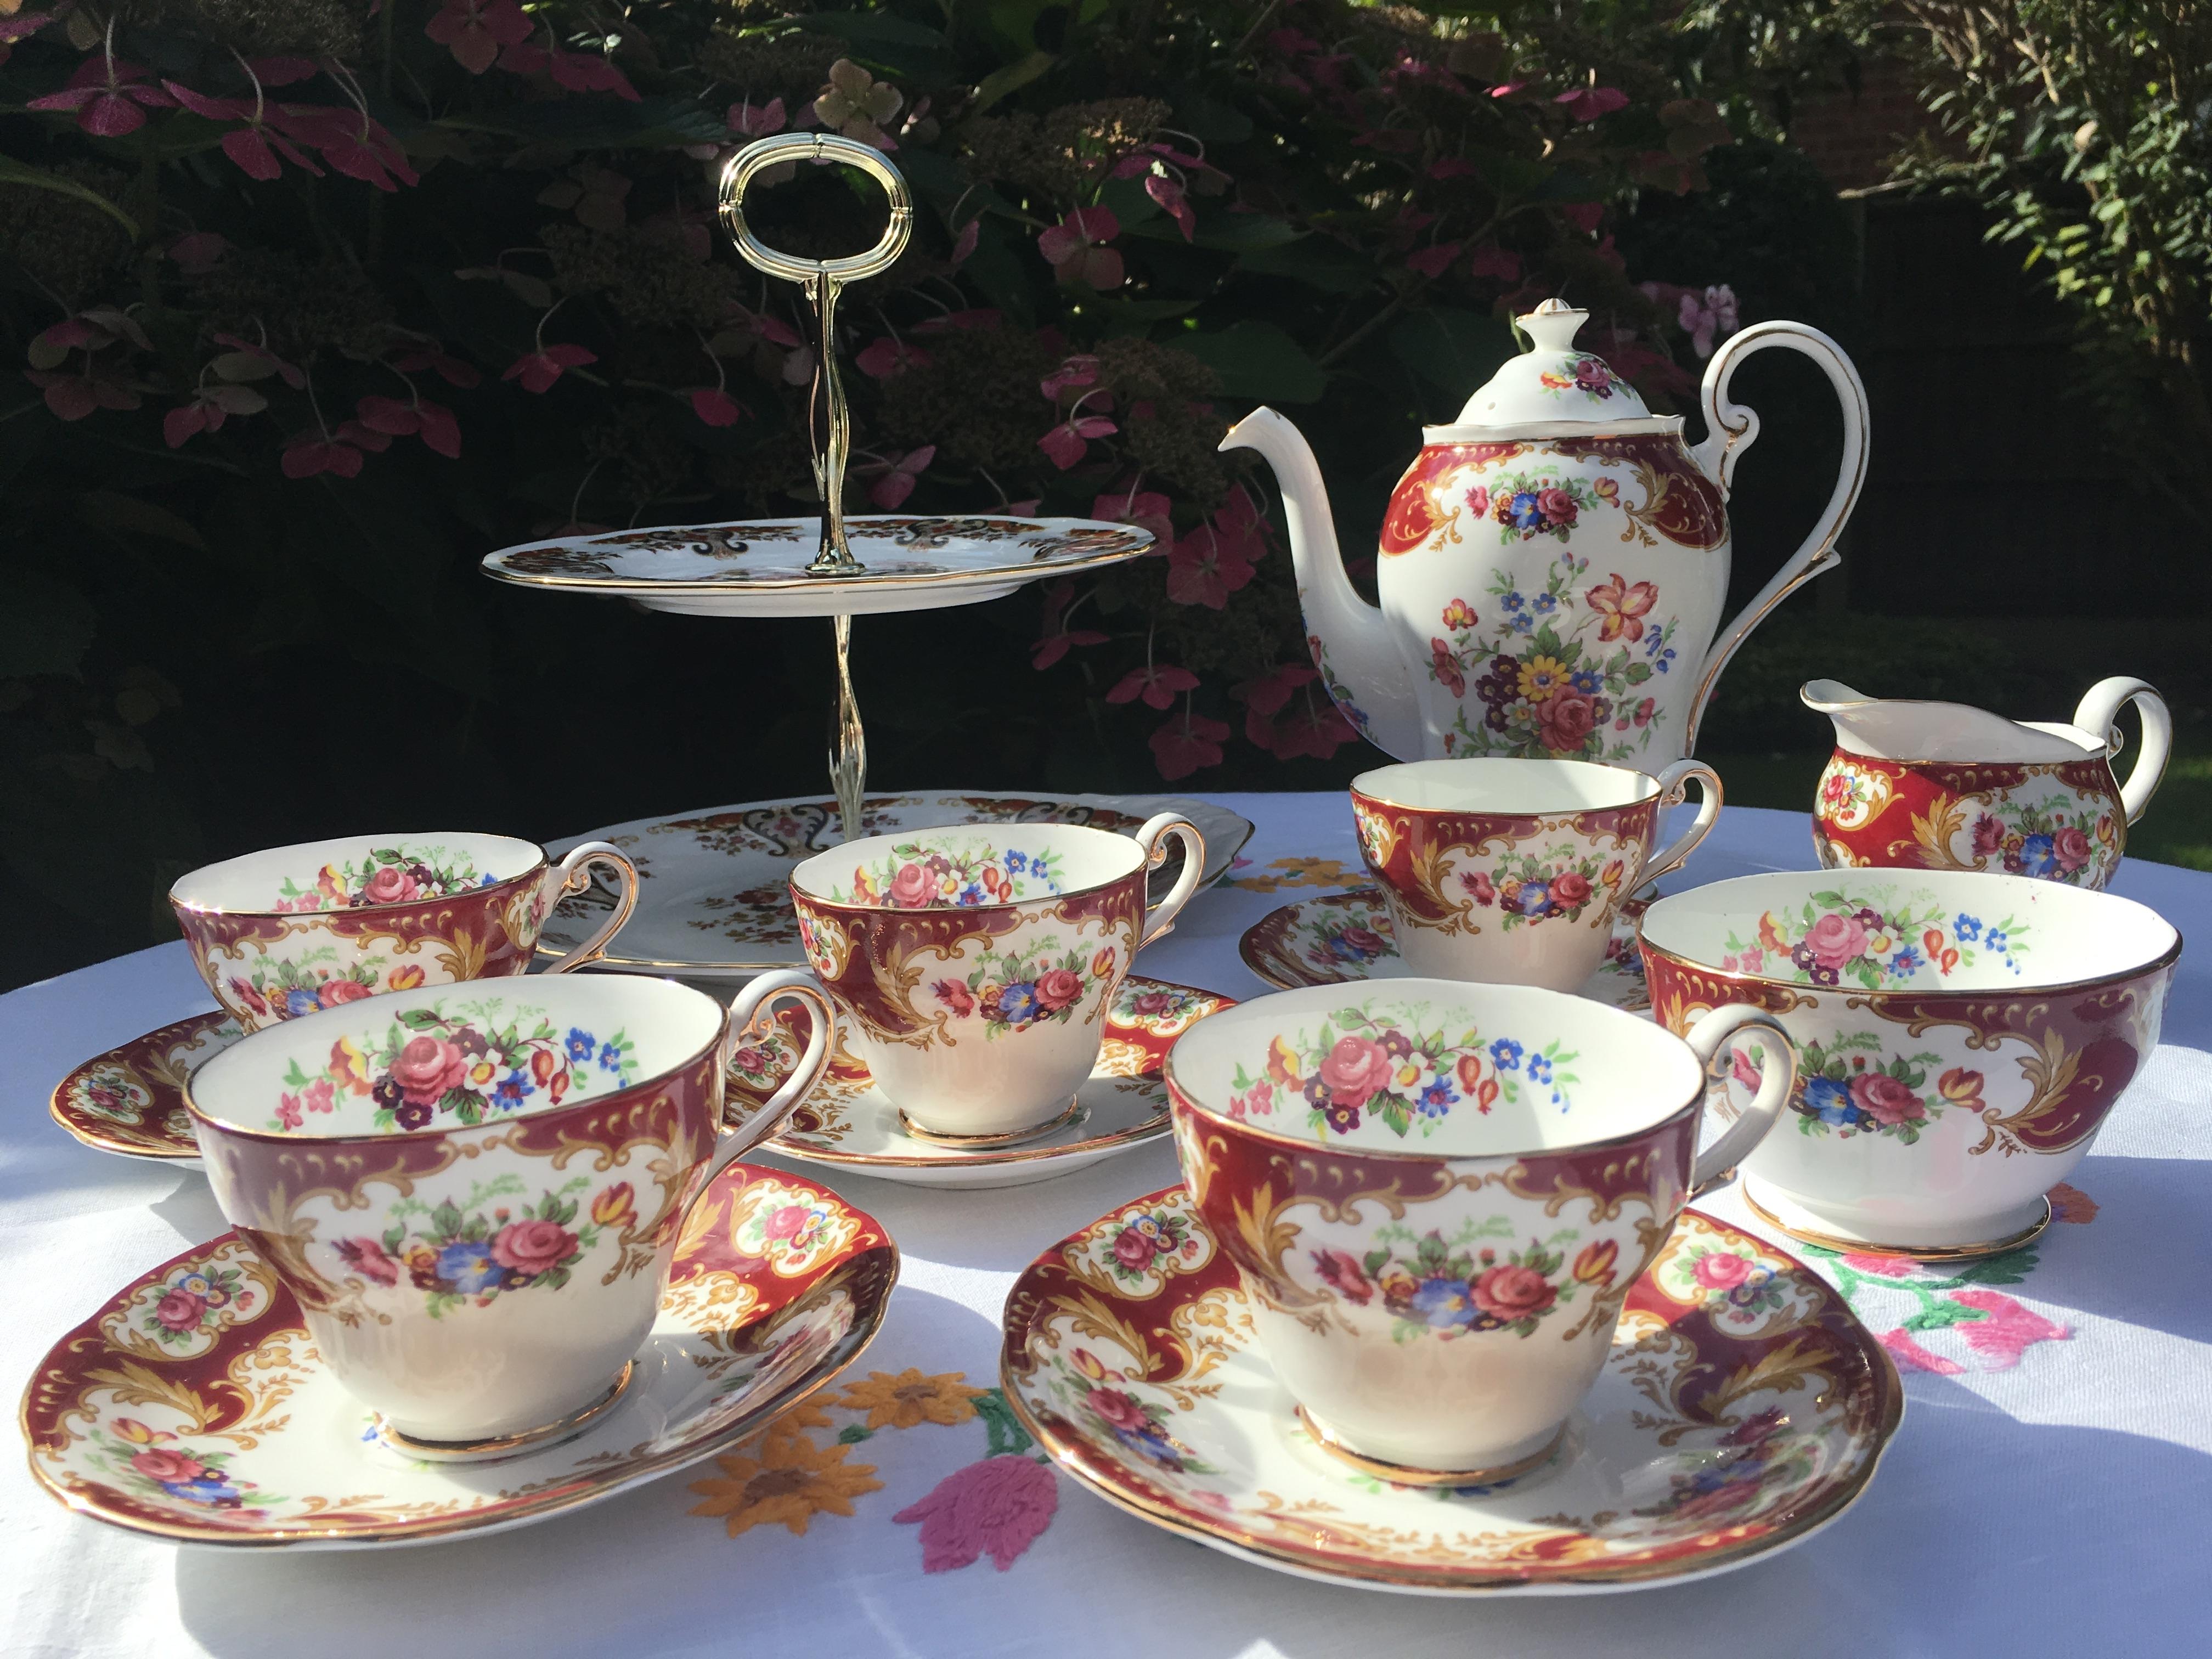 Royal Standard Lady Fayre teaset